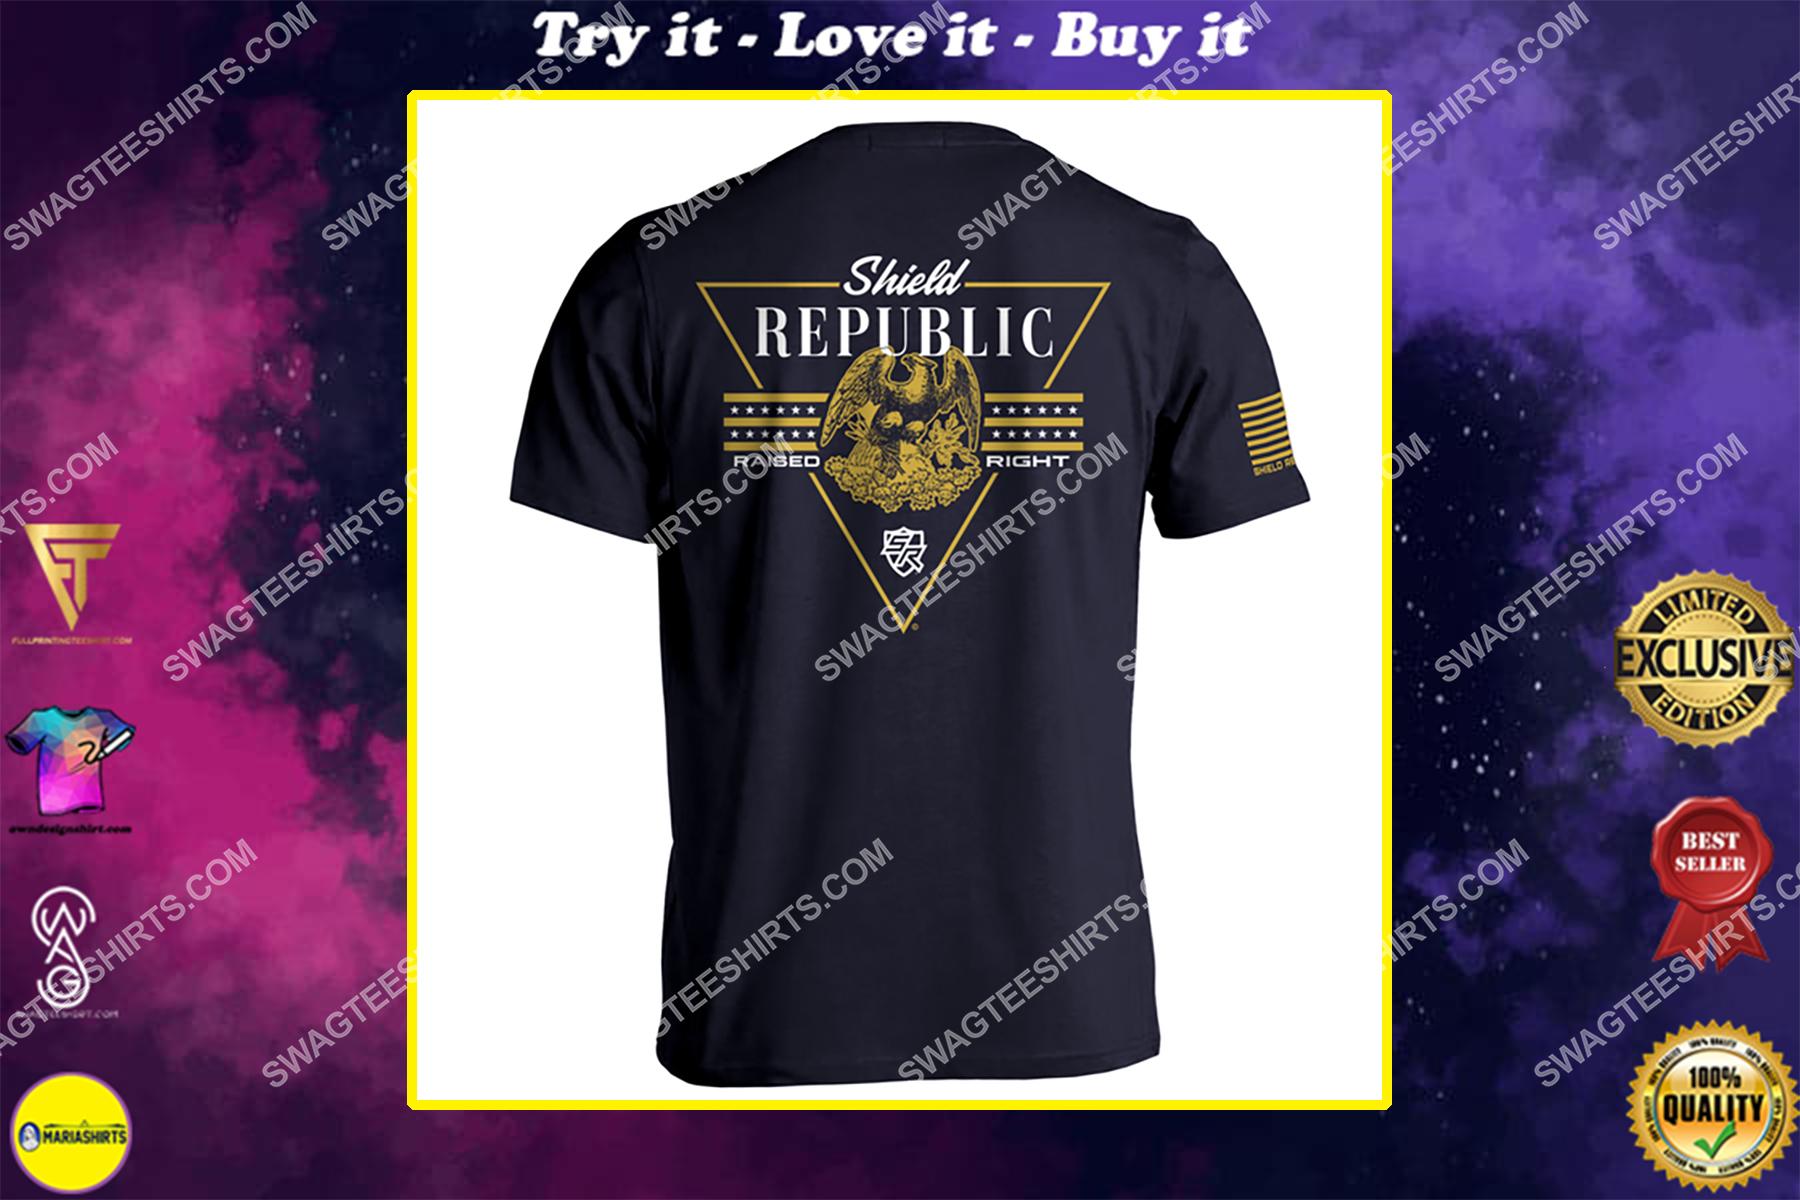 shield republic raised political full print shirt